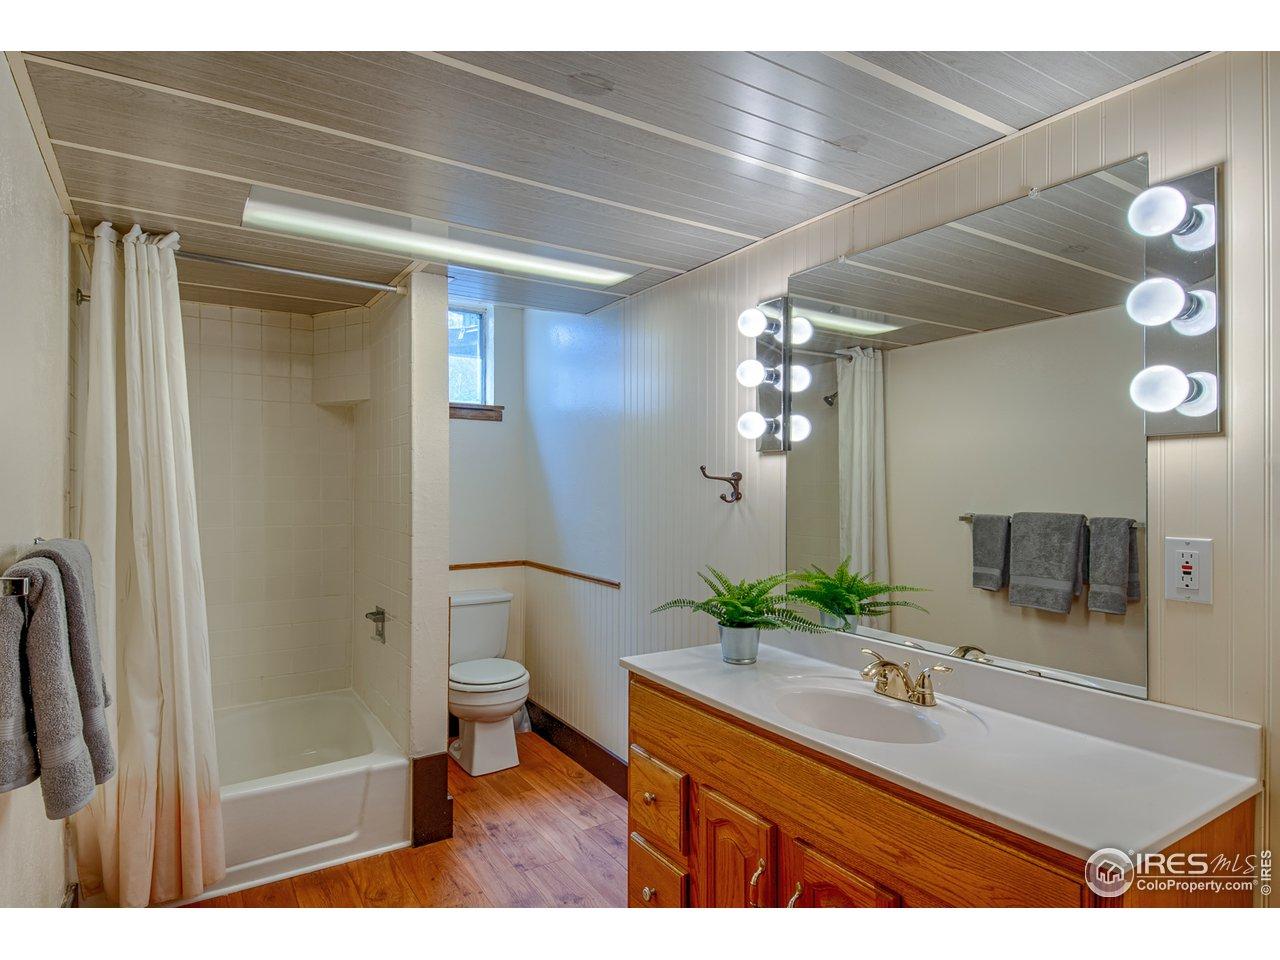 Lower level spacious 3/4 bath